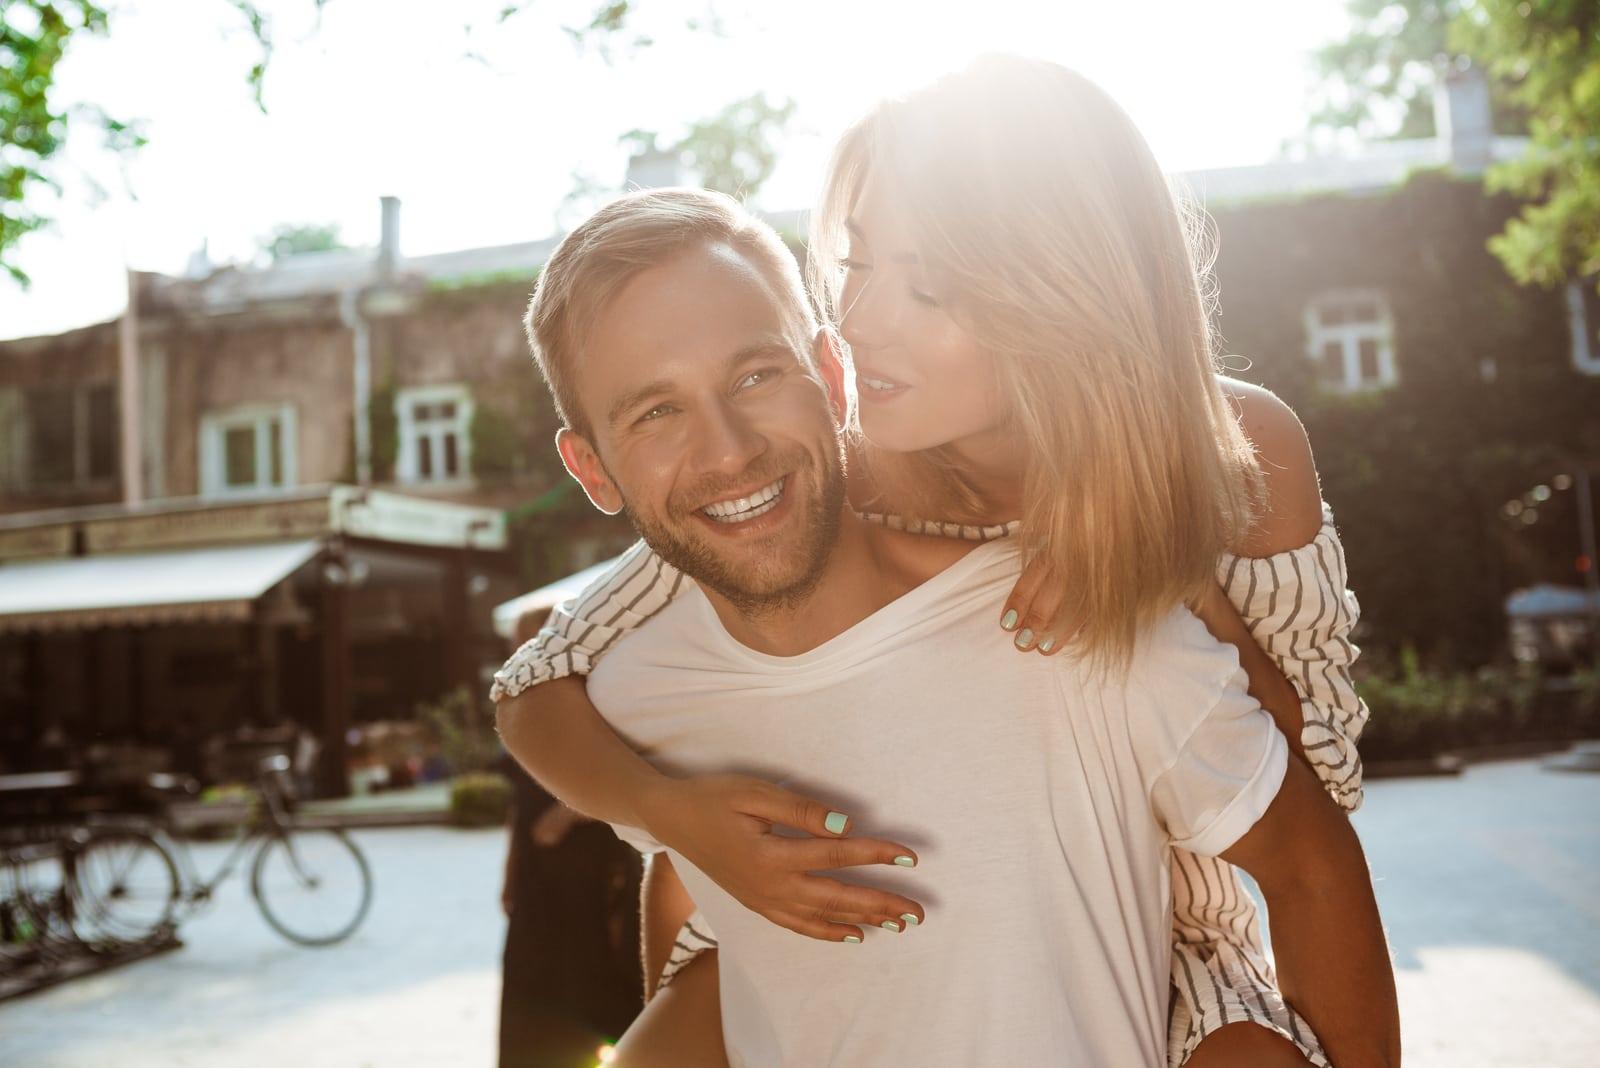 a happy couple in love hug